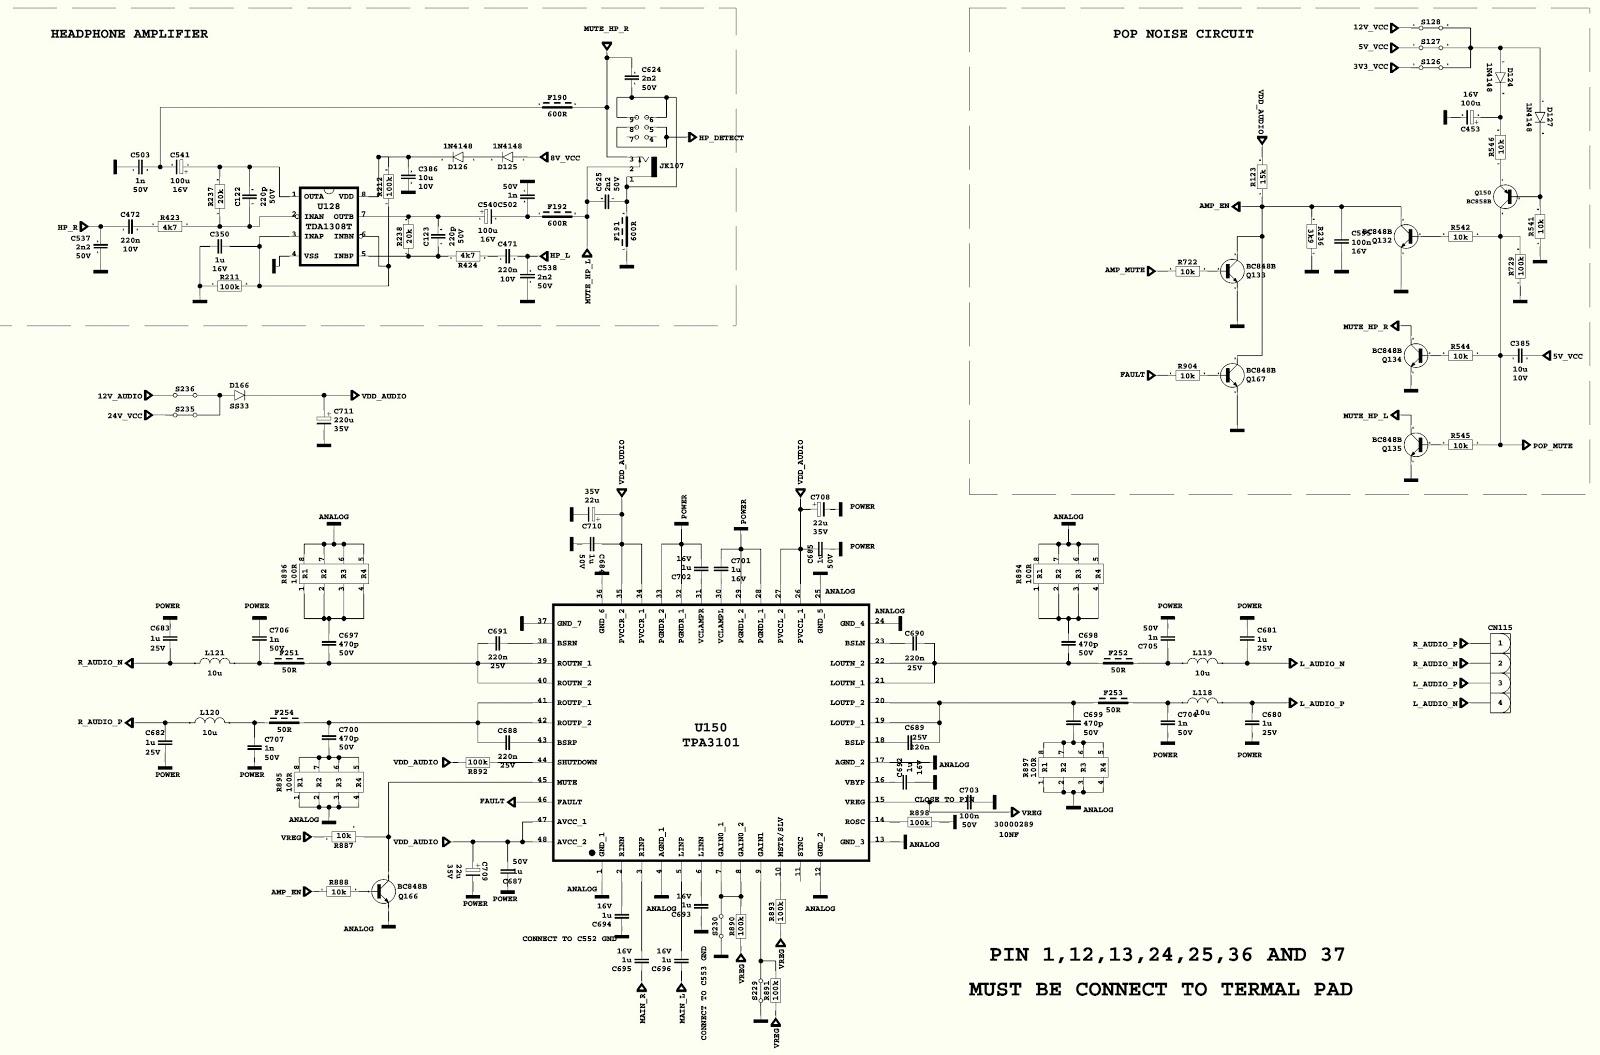 Vestel 17mb25 Tft Lcd Tv Kit Circuit Diagram Full Schematic Headphone Amplifier Pwb